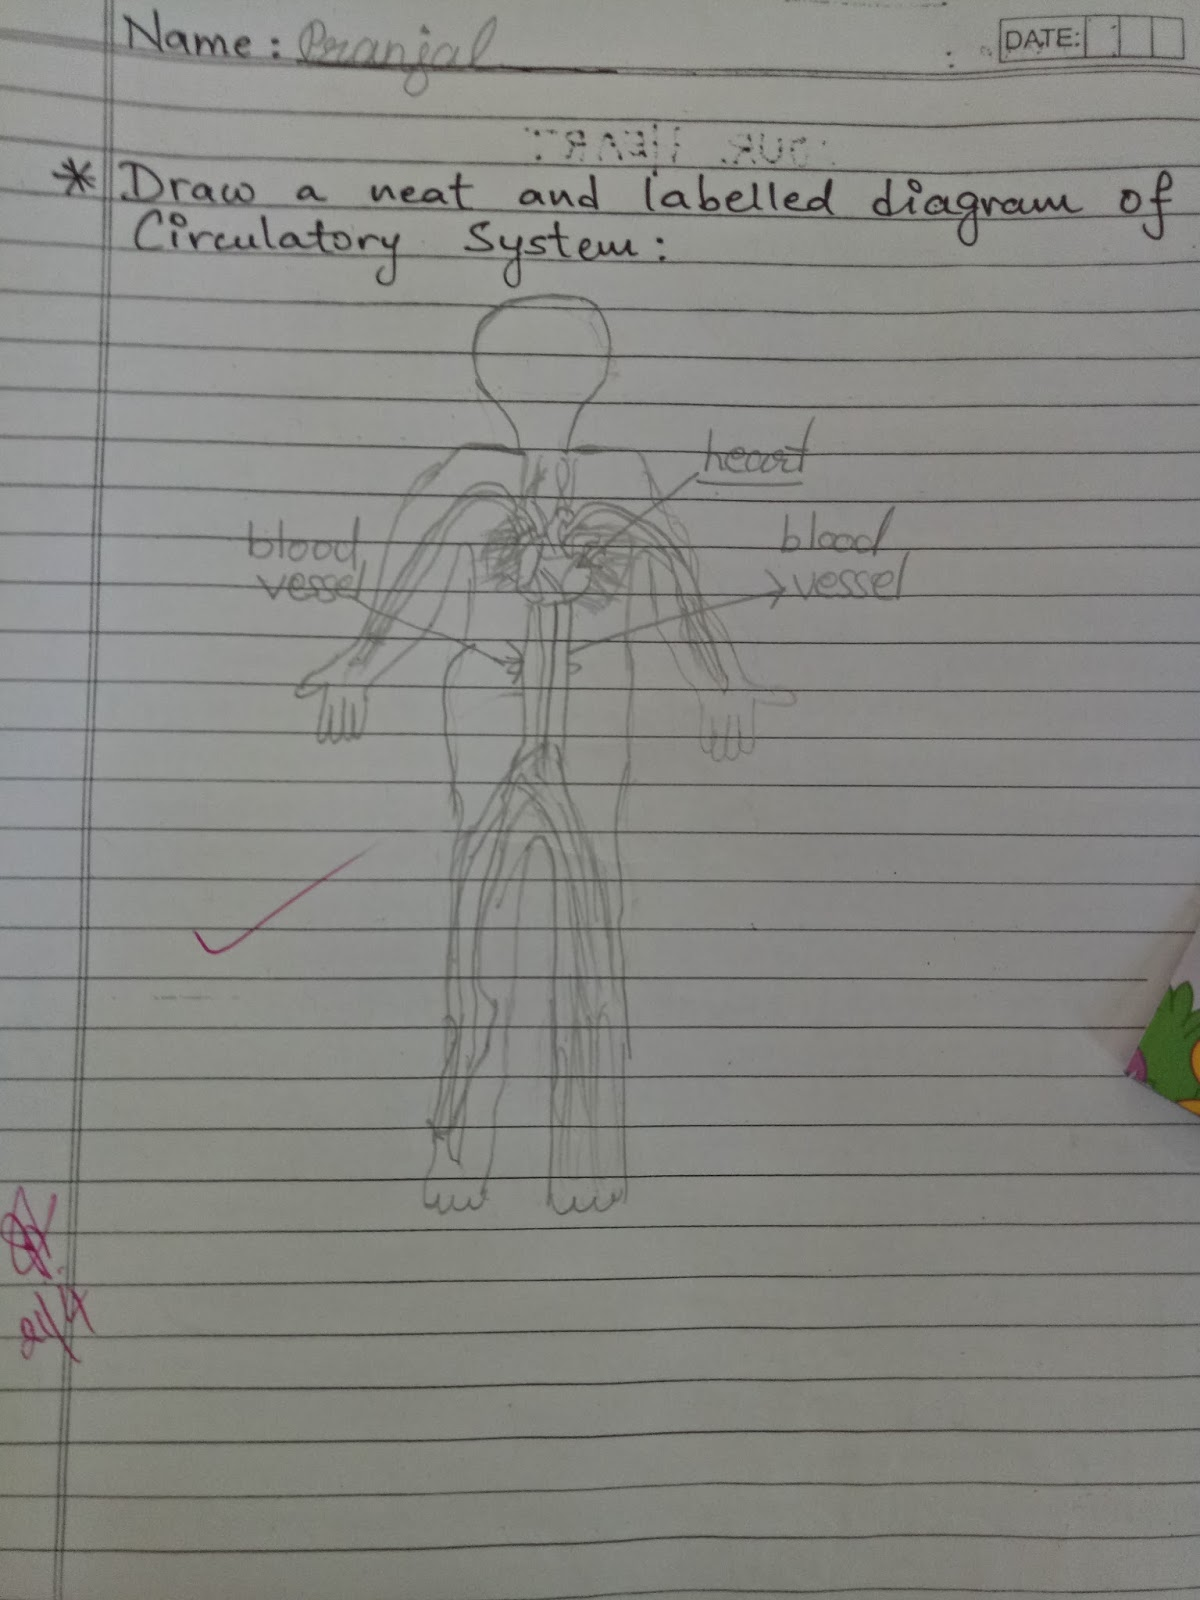 Pis Vadodara Std 4 Evs Ch Human Body Systems Practice